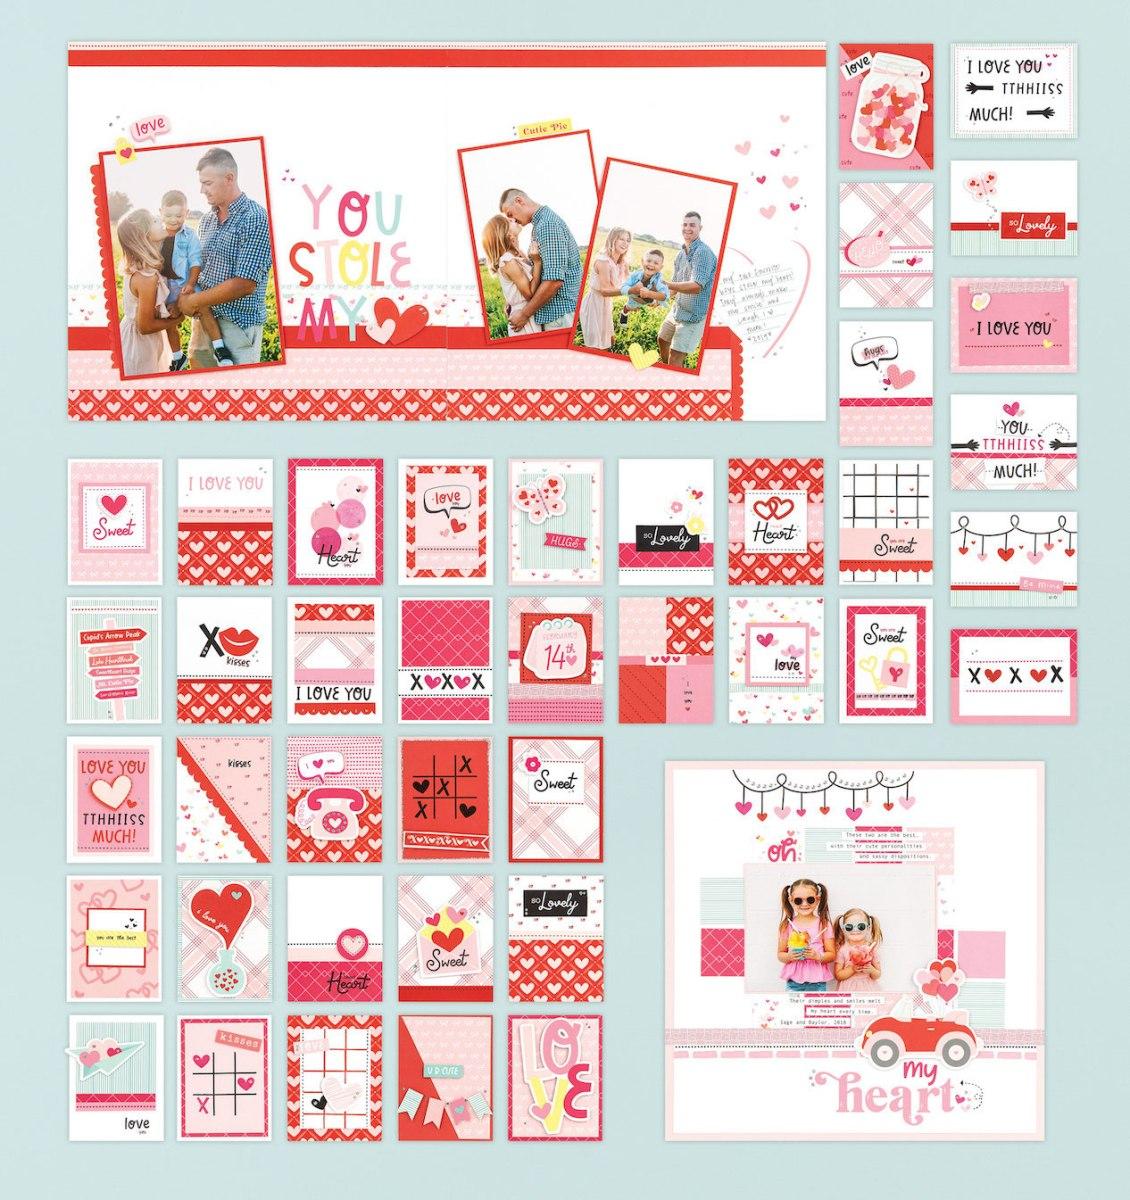 New Year Catalog #ctmh #closetomyheart #scrapbooking #cardmaking #papercrafting #ctmhohmyheart #ctmhallaroundcreativity #nsm #nationalscrapbookingmonth #valentine #valentine'sday